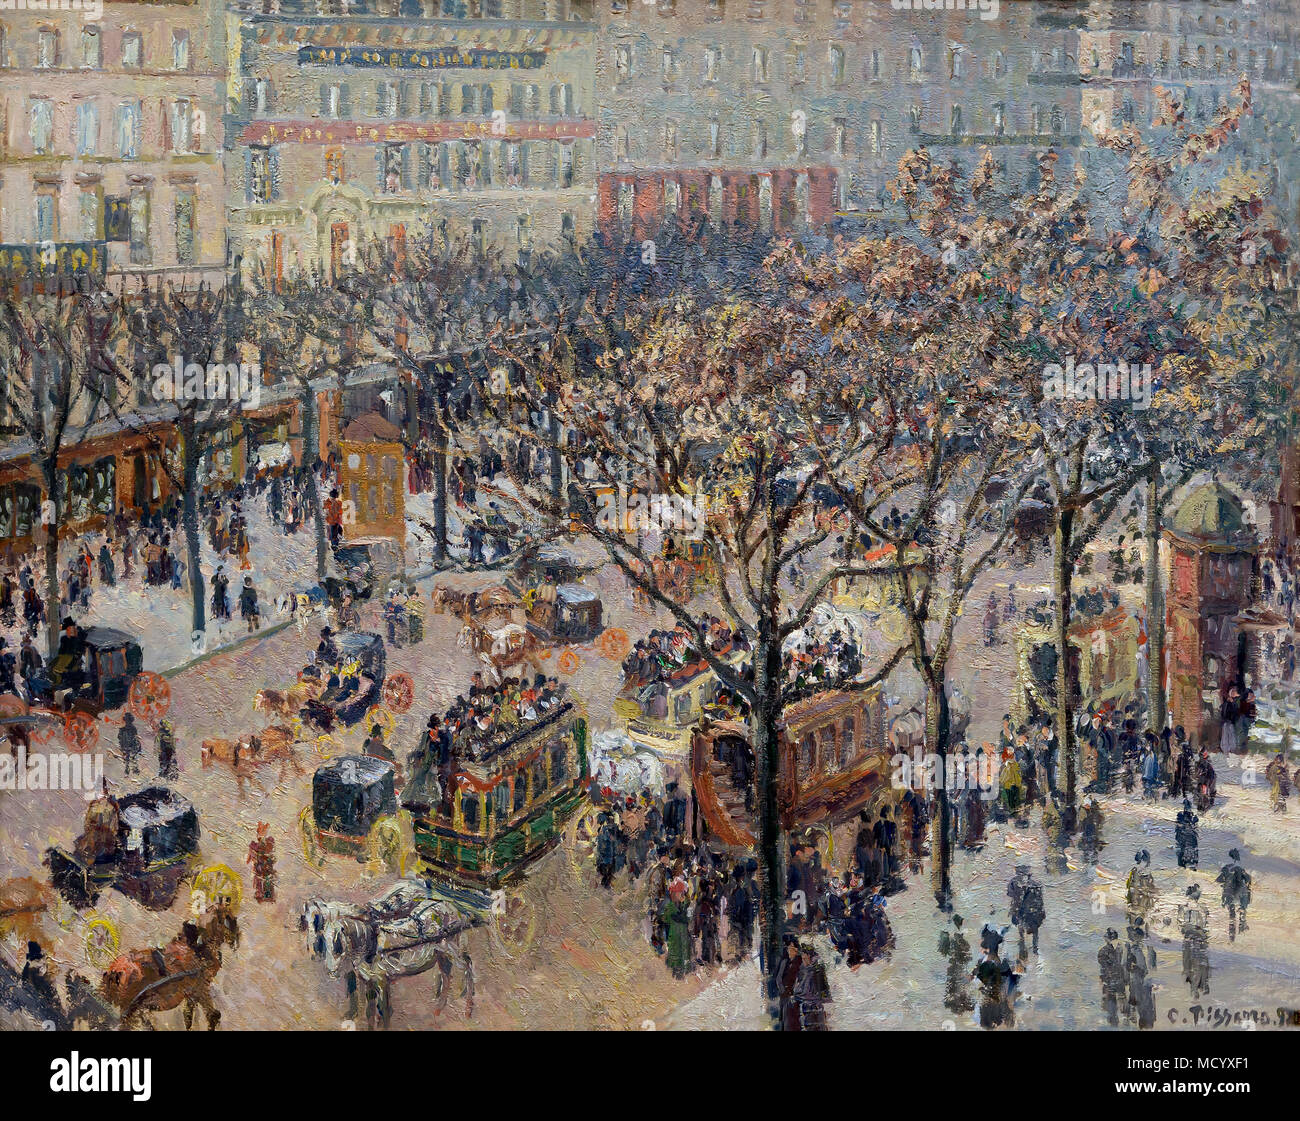 Boulevard des Italiens, Morgen, Sonnenlicht, Camille Pissarro, 1897, Nationalgalerie, Washington DC, USA, Nordamerika Stockbild